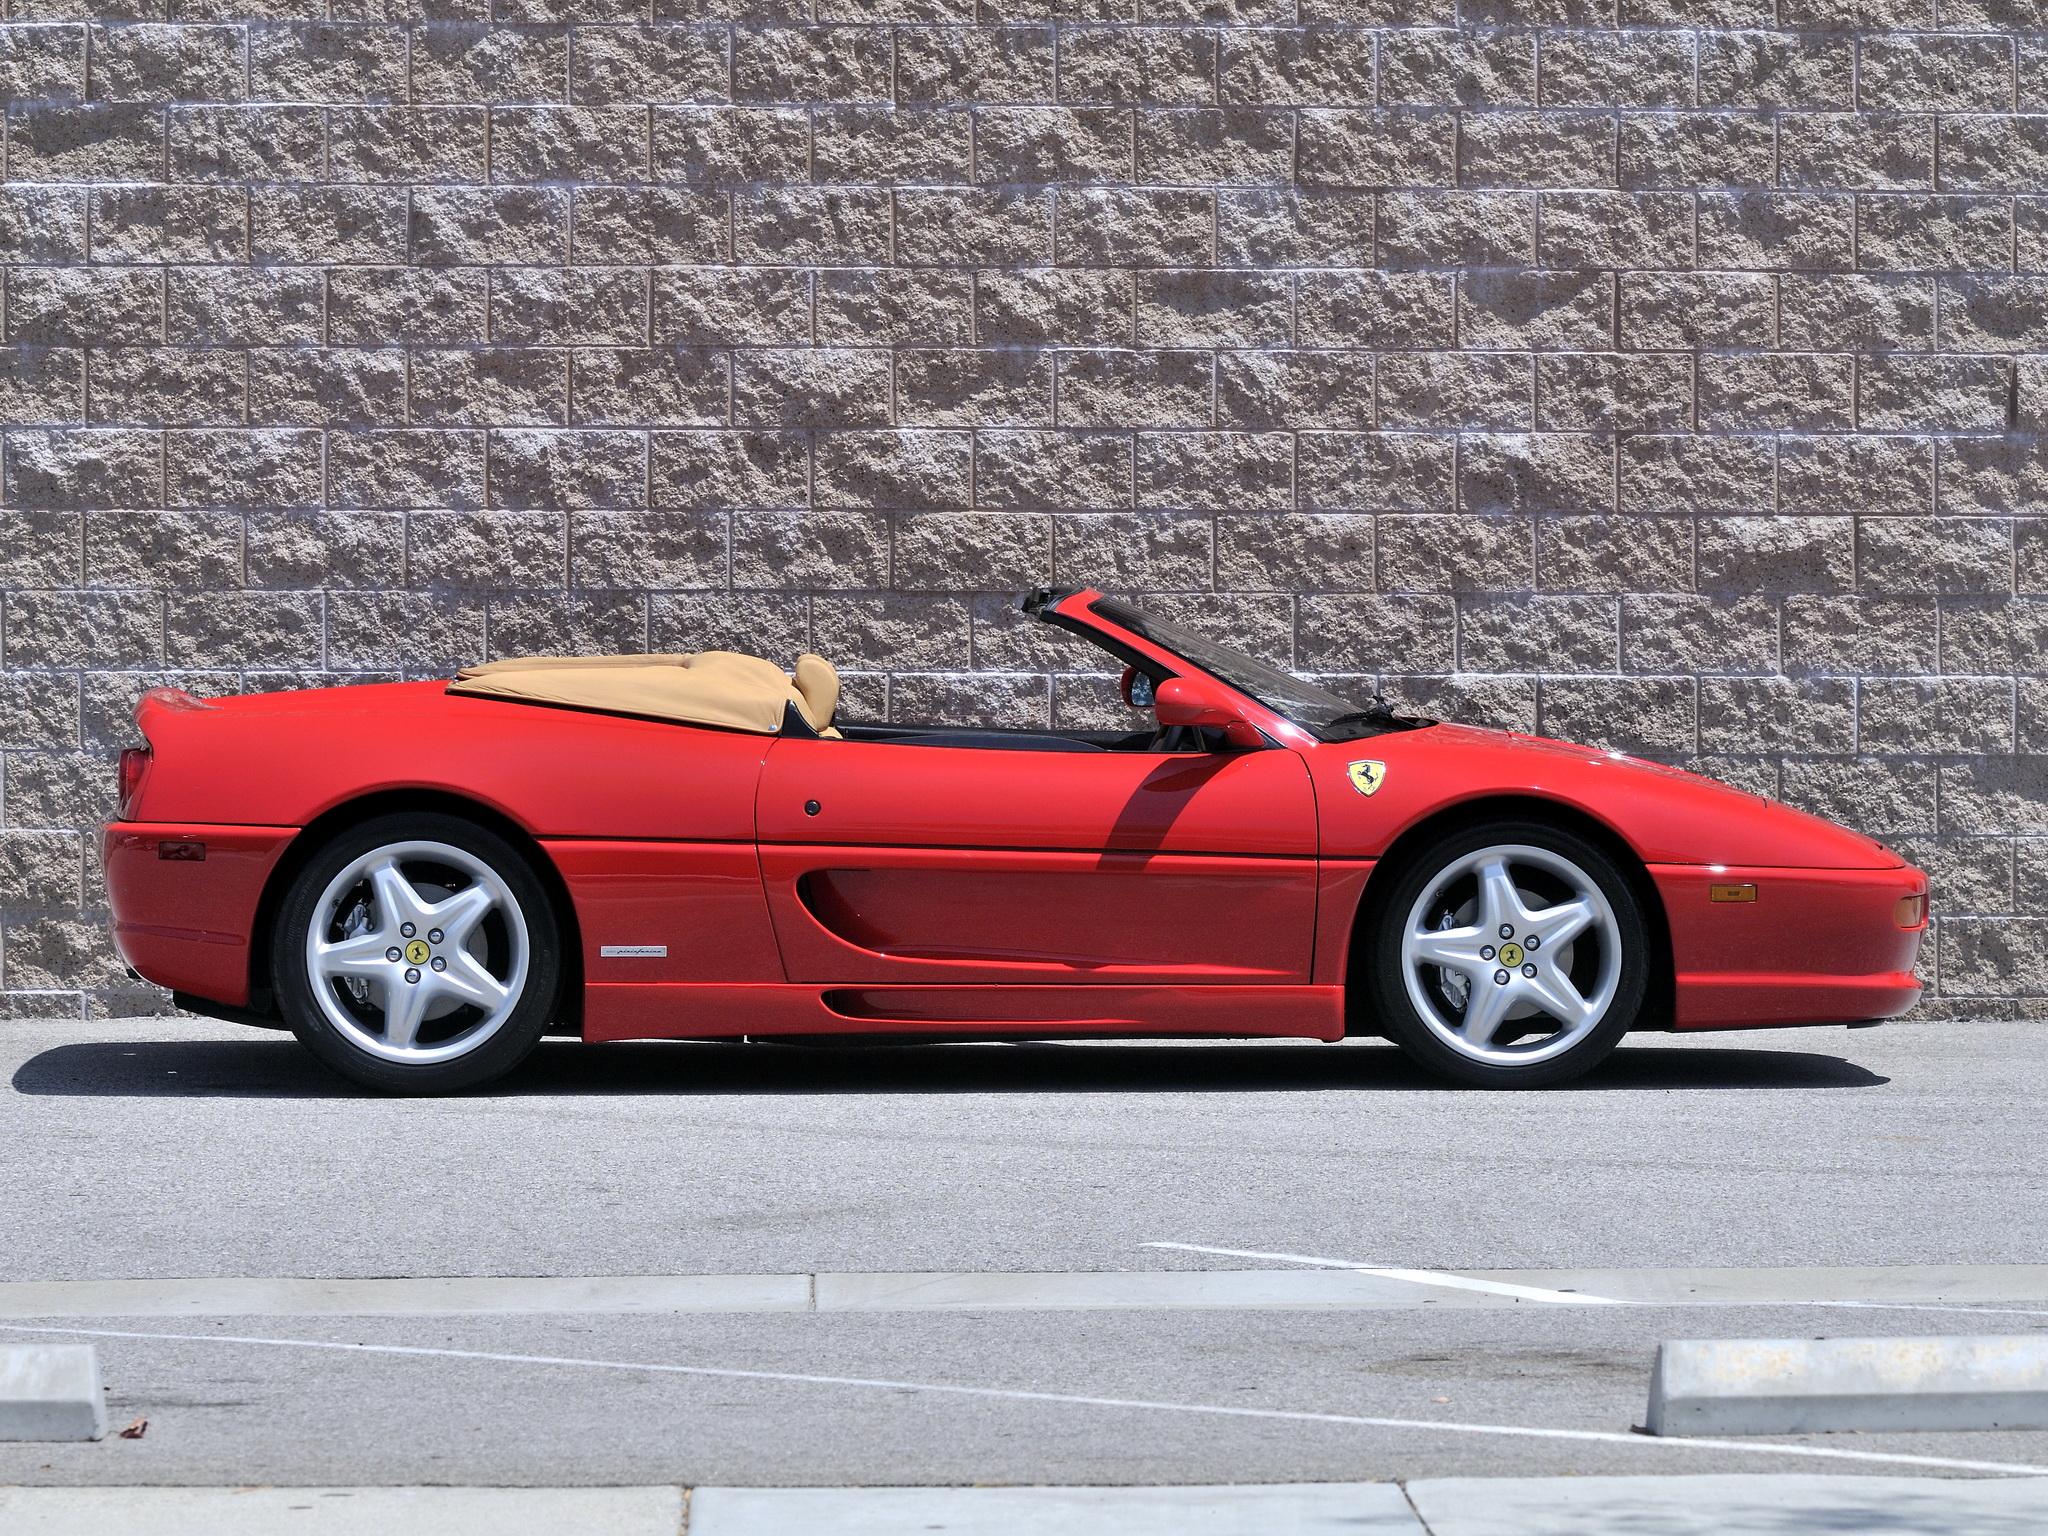 Ferrari F355 Spyder